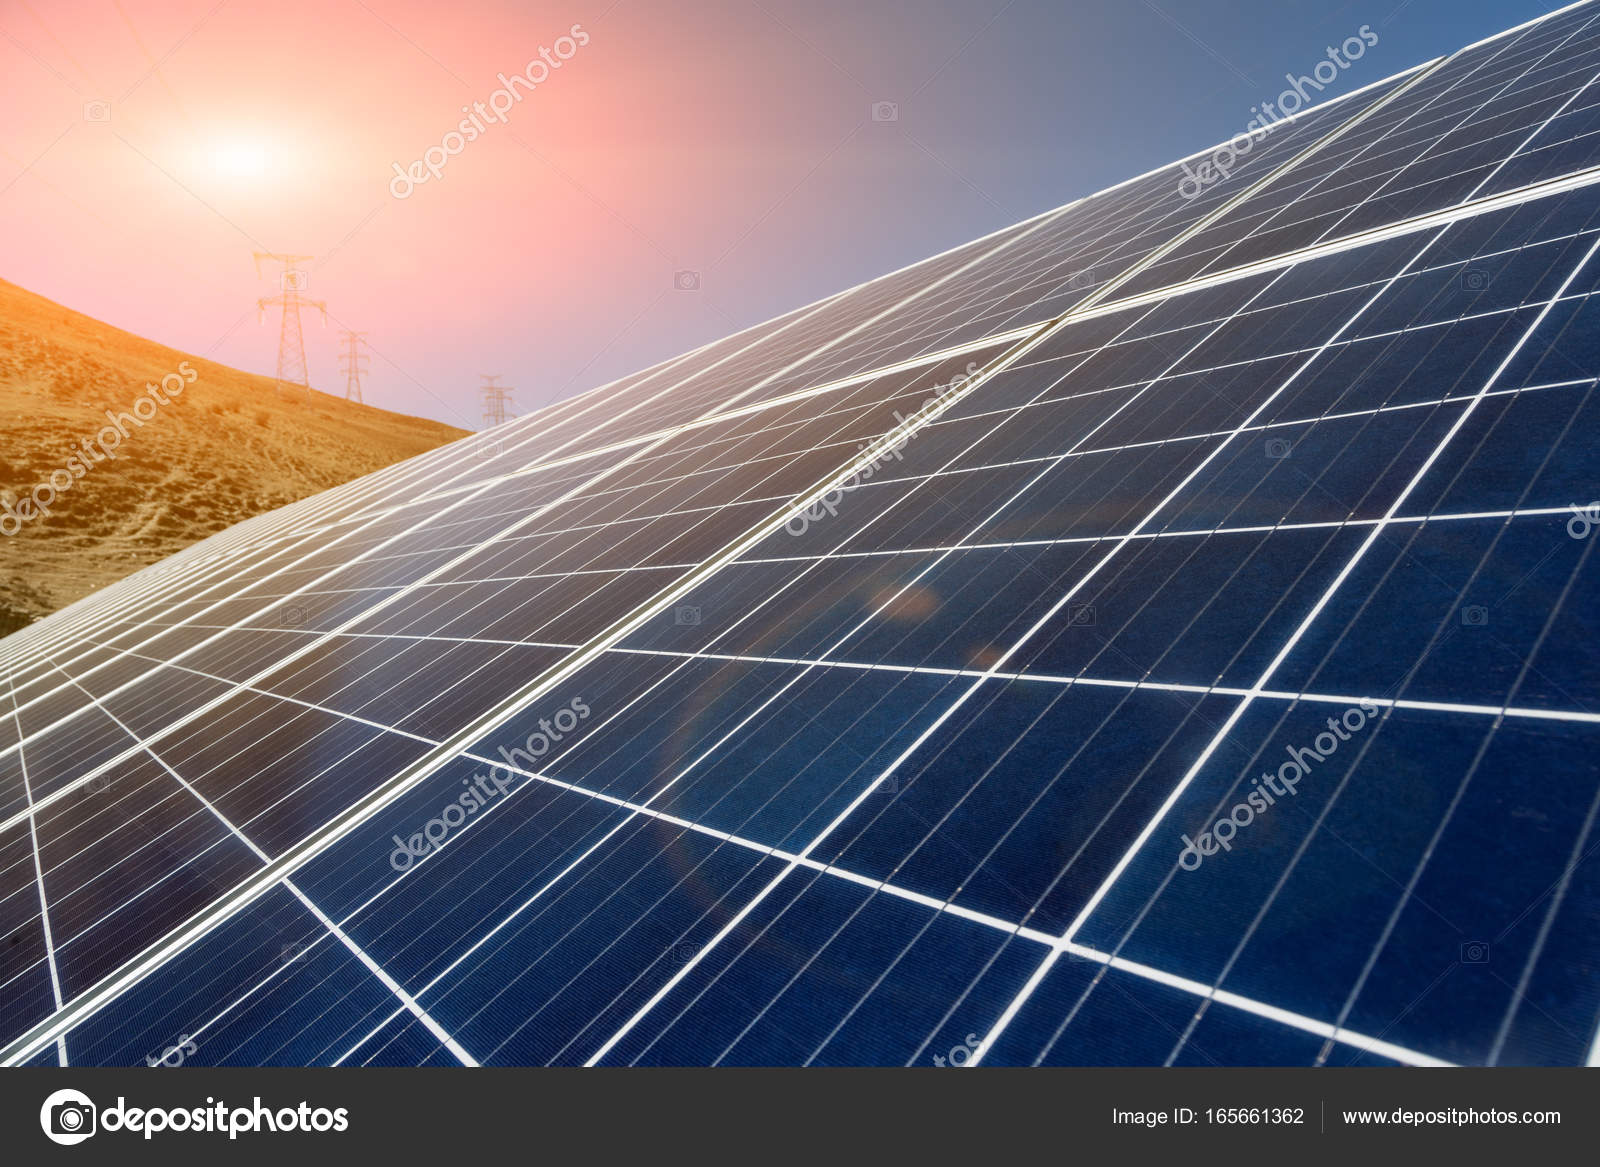 solar power tower